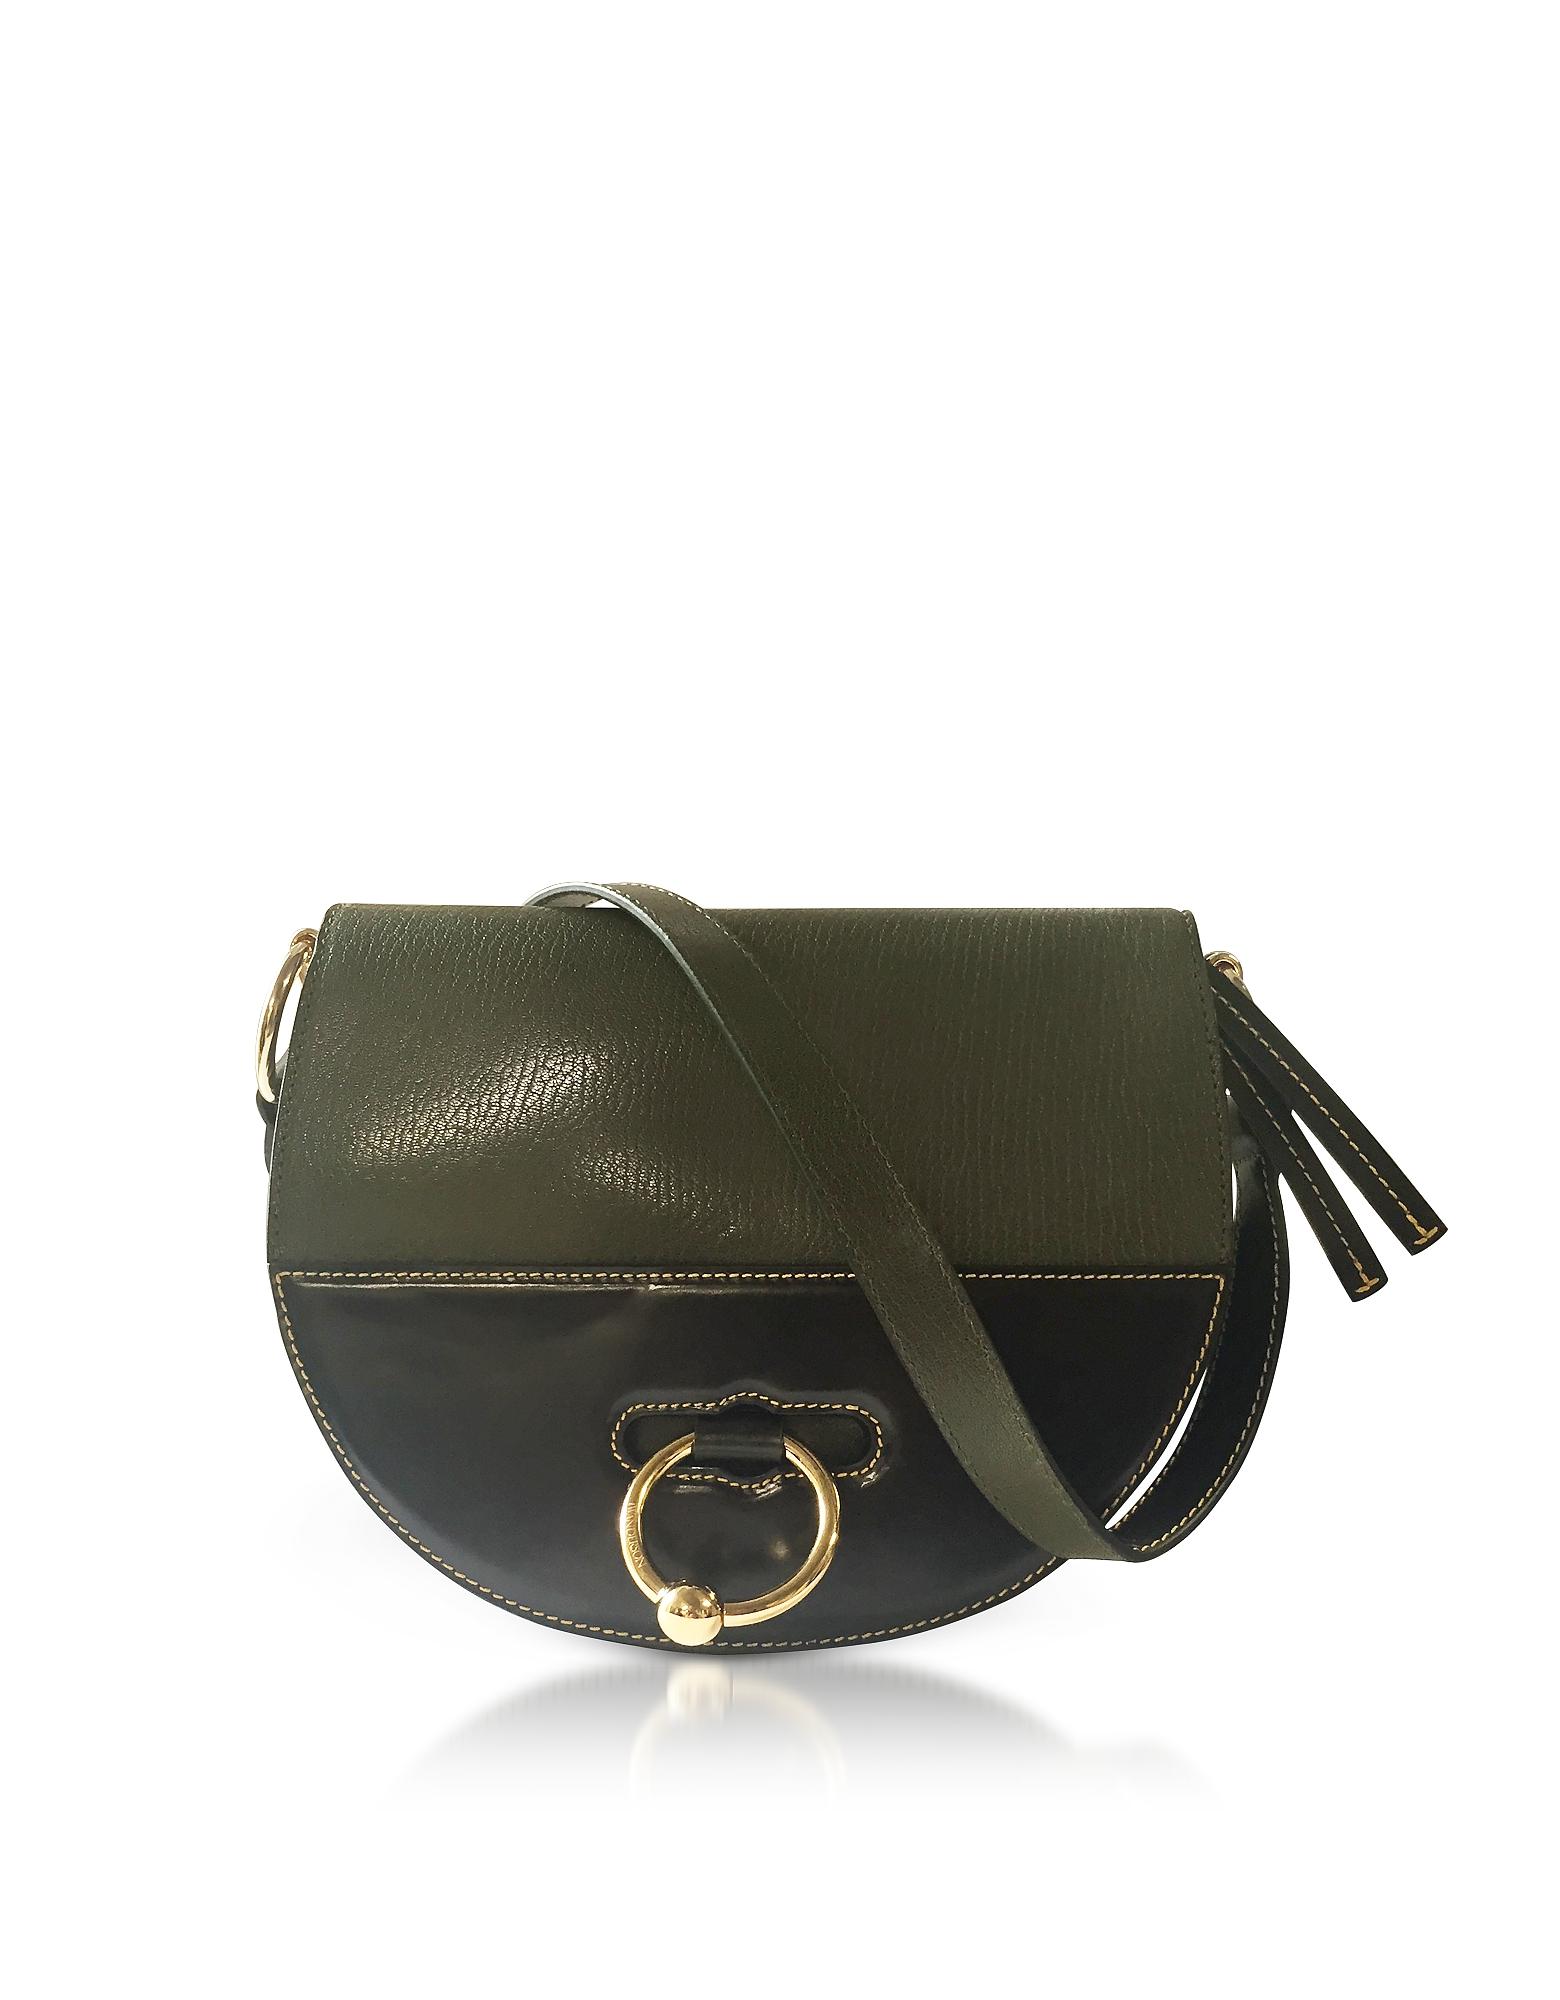 Latch Bag w/Shoulder Strap